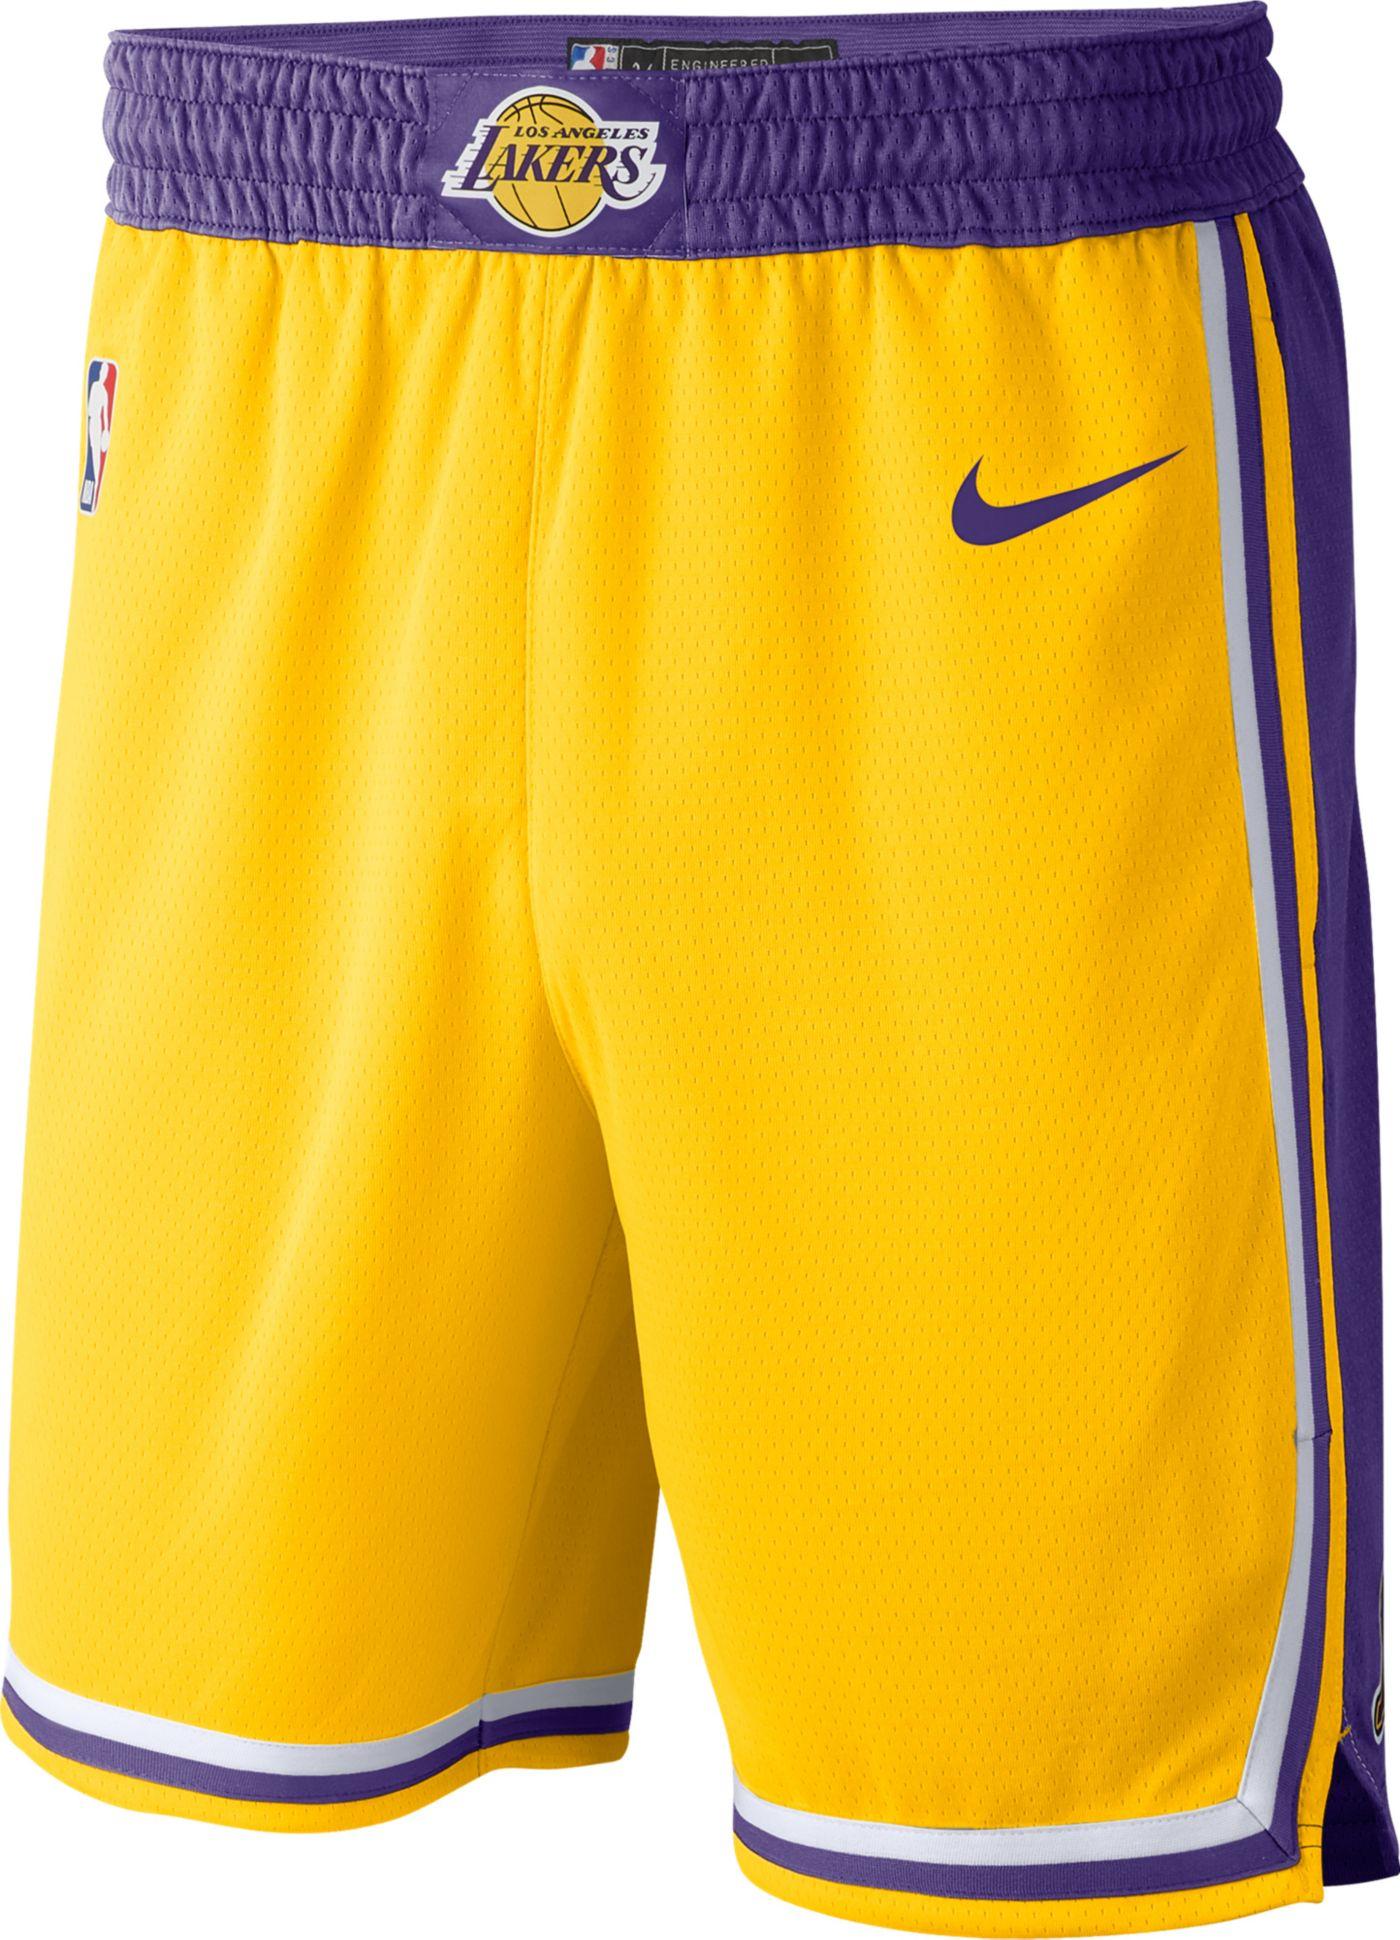 Nike Men's Los Angeles Lakers Dri-FIT Swingman Shorts